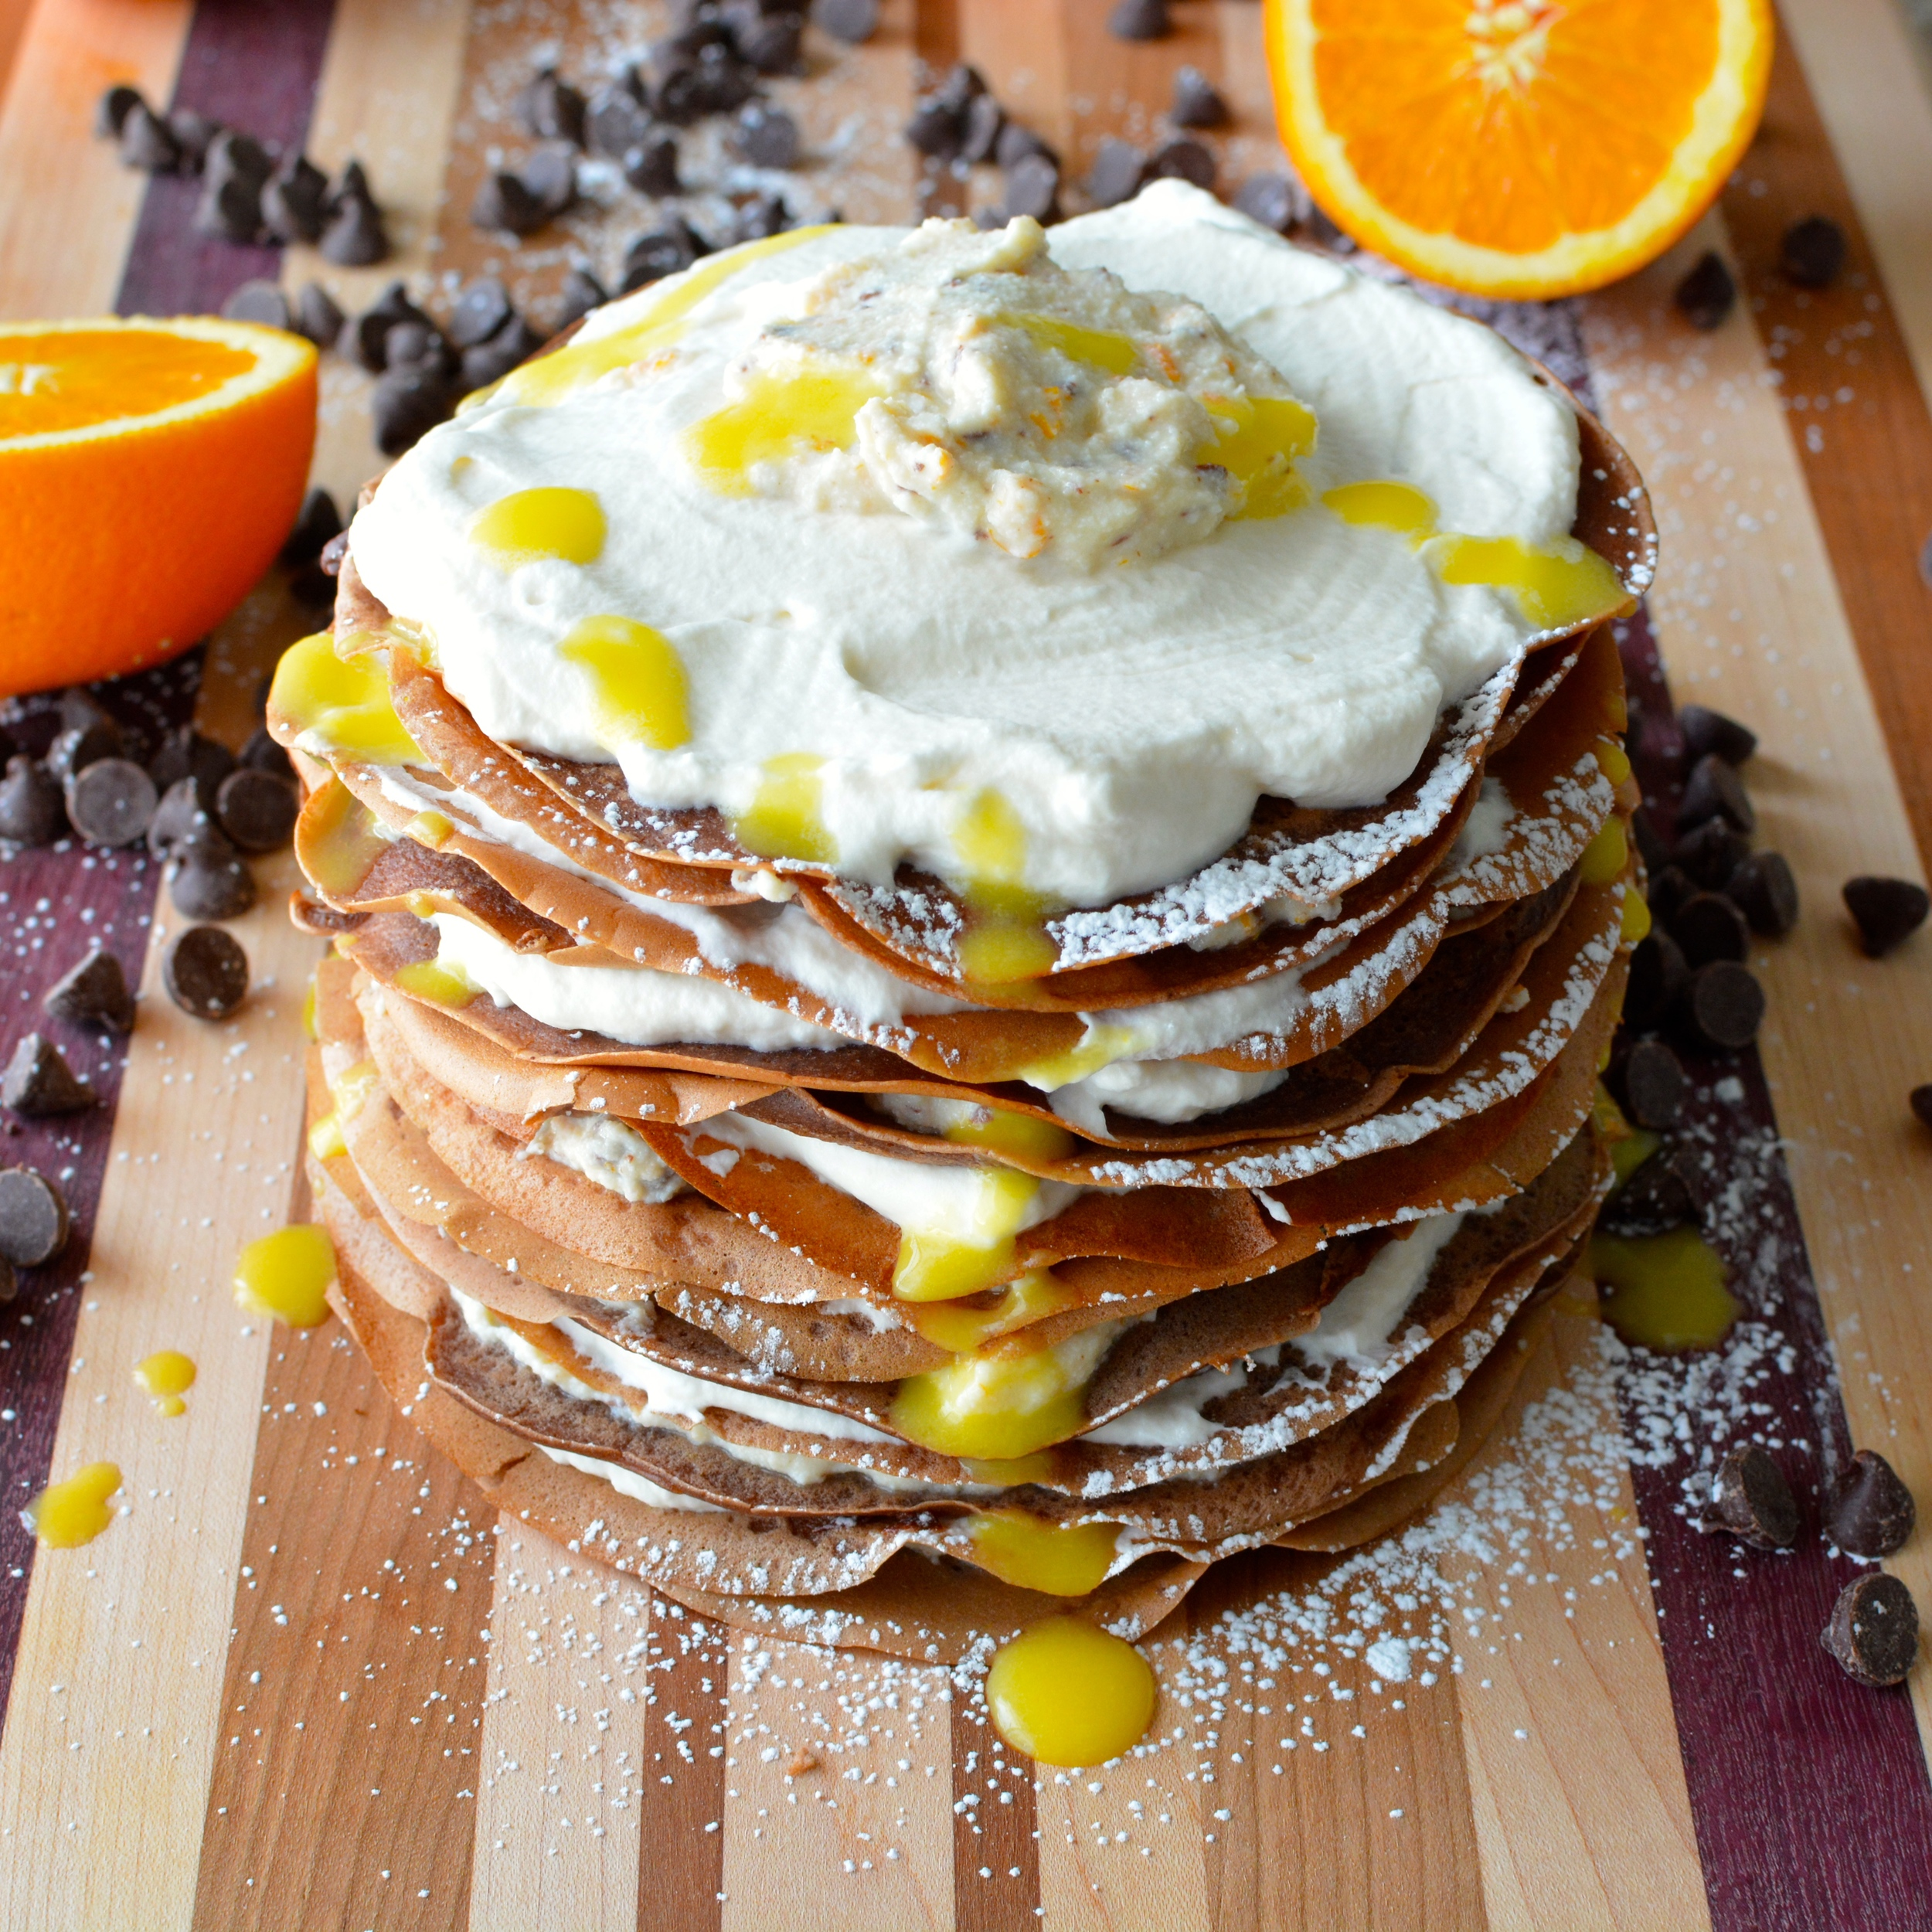 Chocolate Cannoli Crepe Cake with Vanilla Whipped Cream, Orange Cream Sauce and Chocolate Ganache